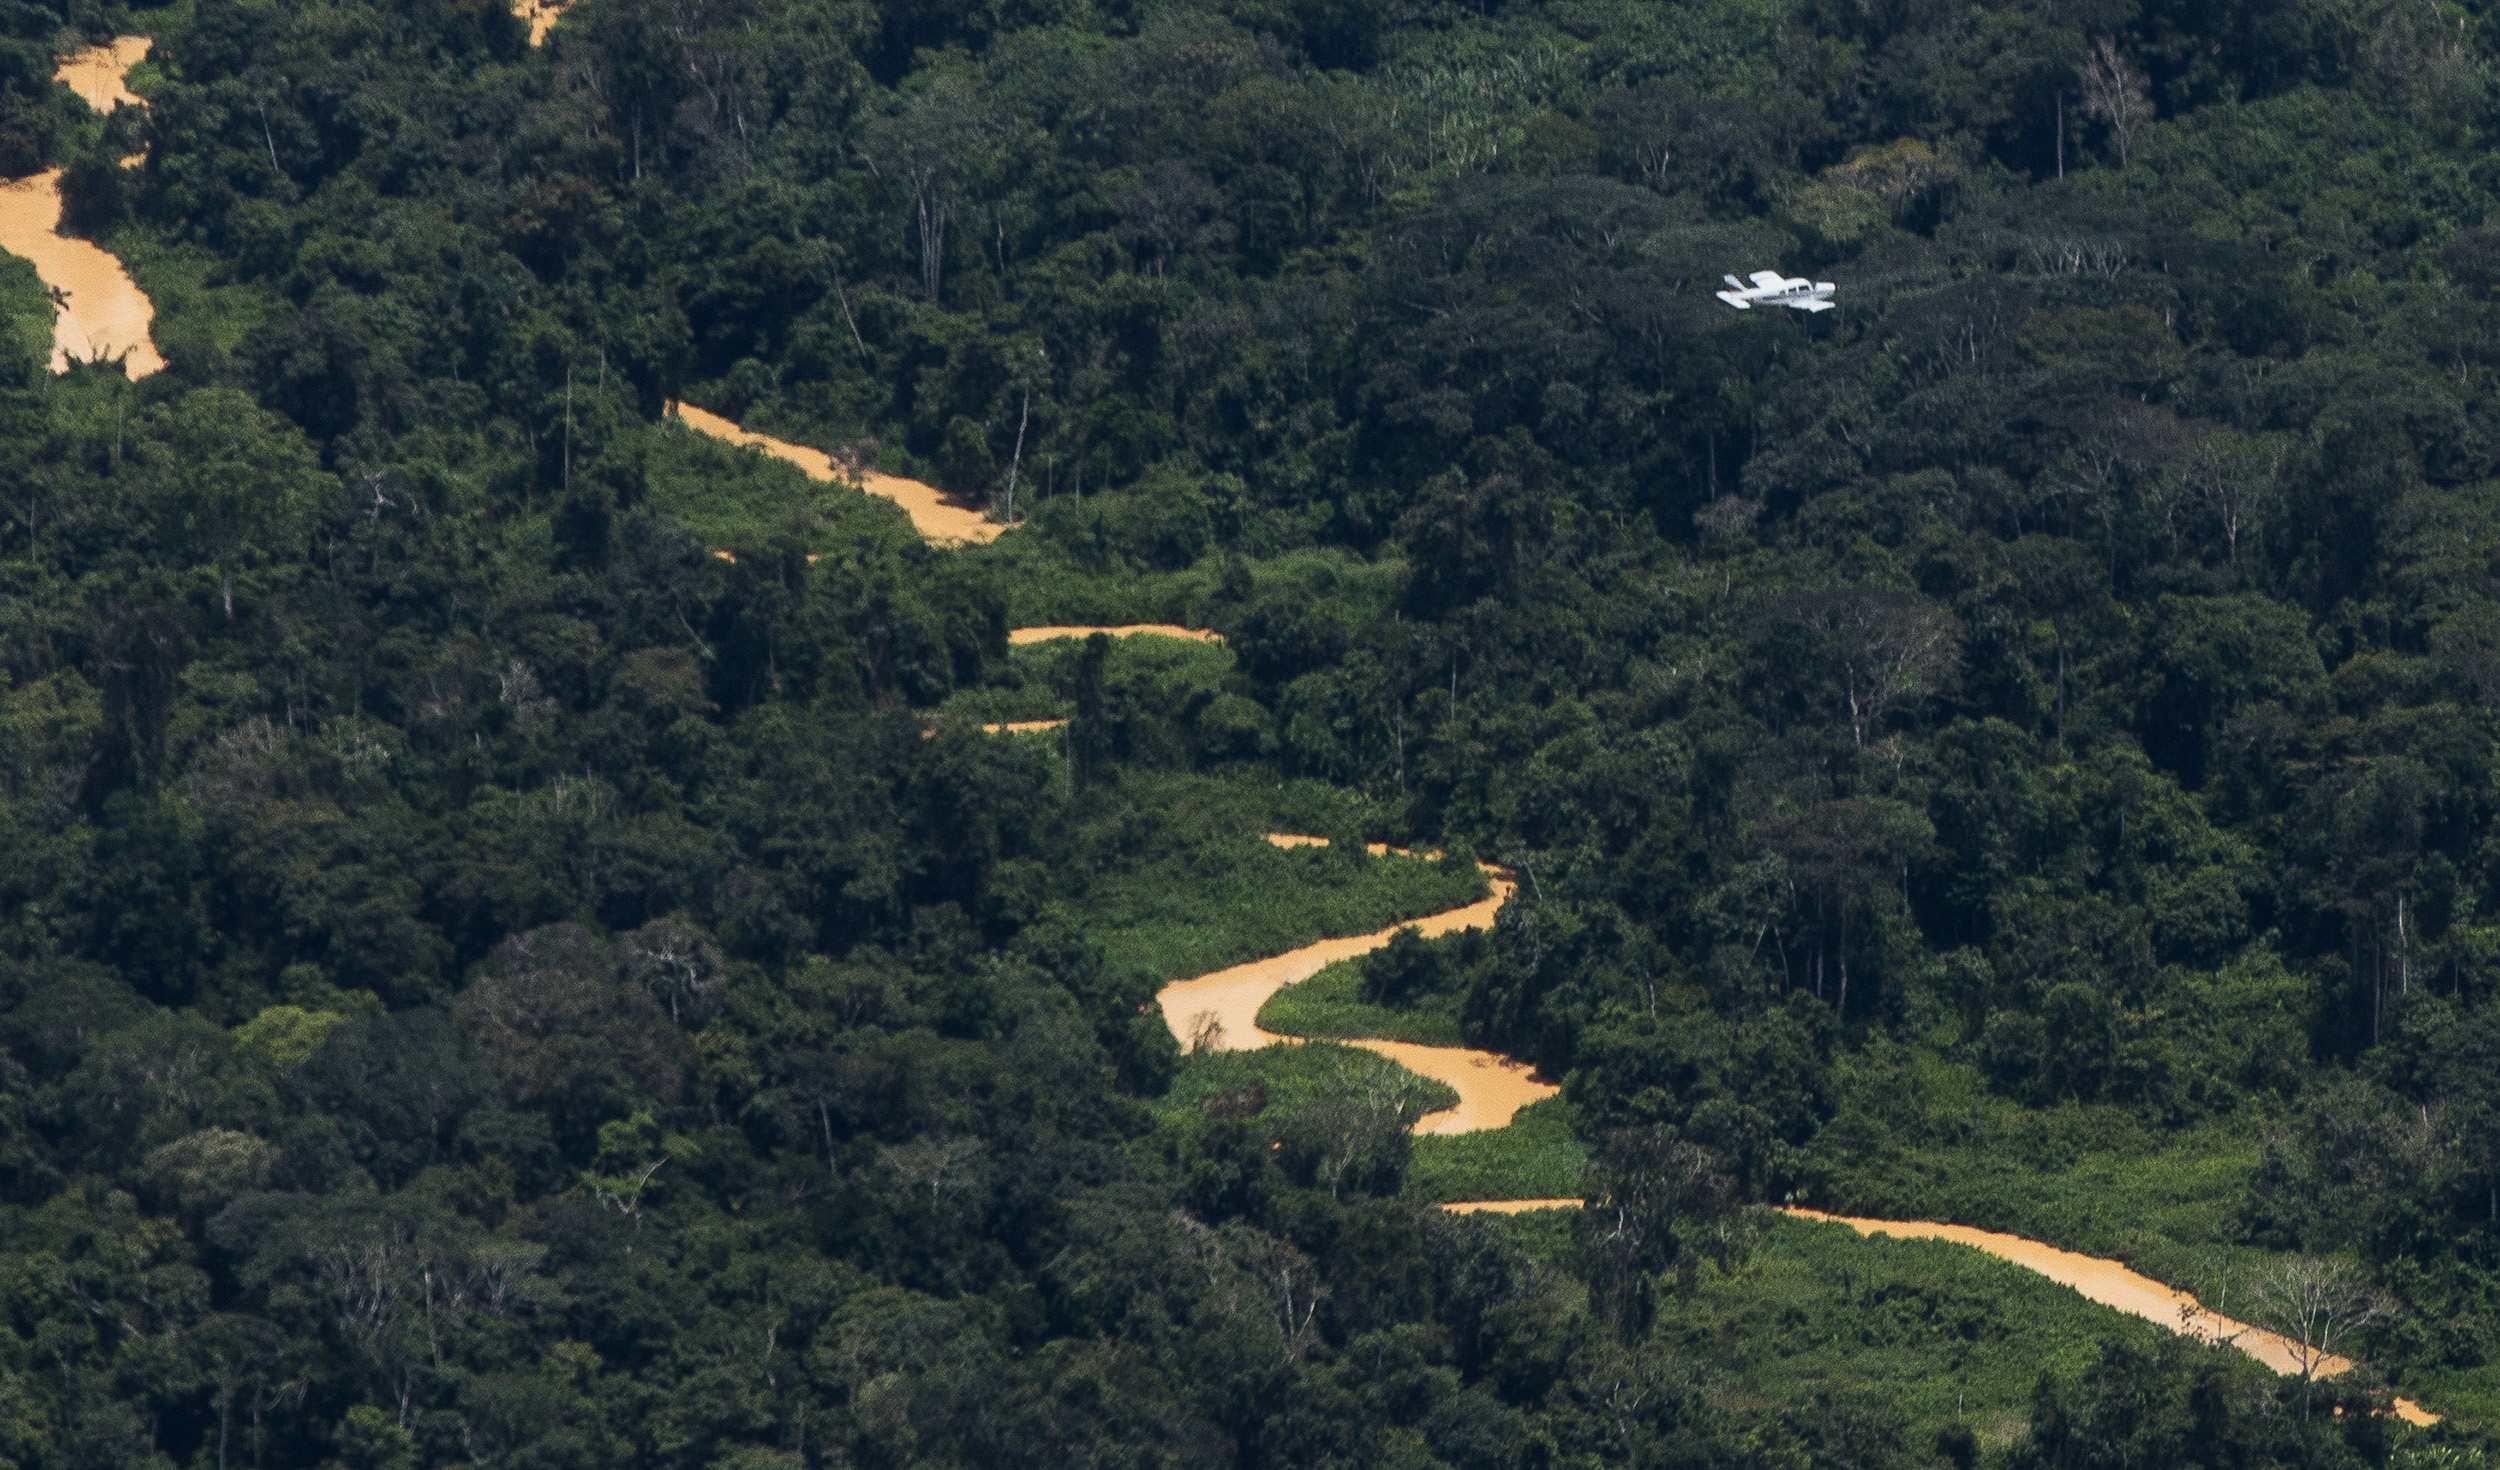 aeronaves sobrevoam garimpo na TI Yanomami